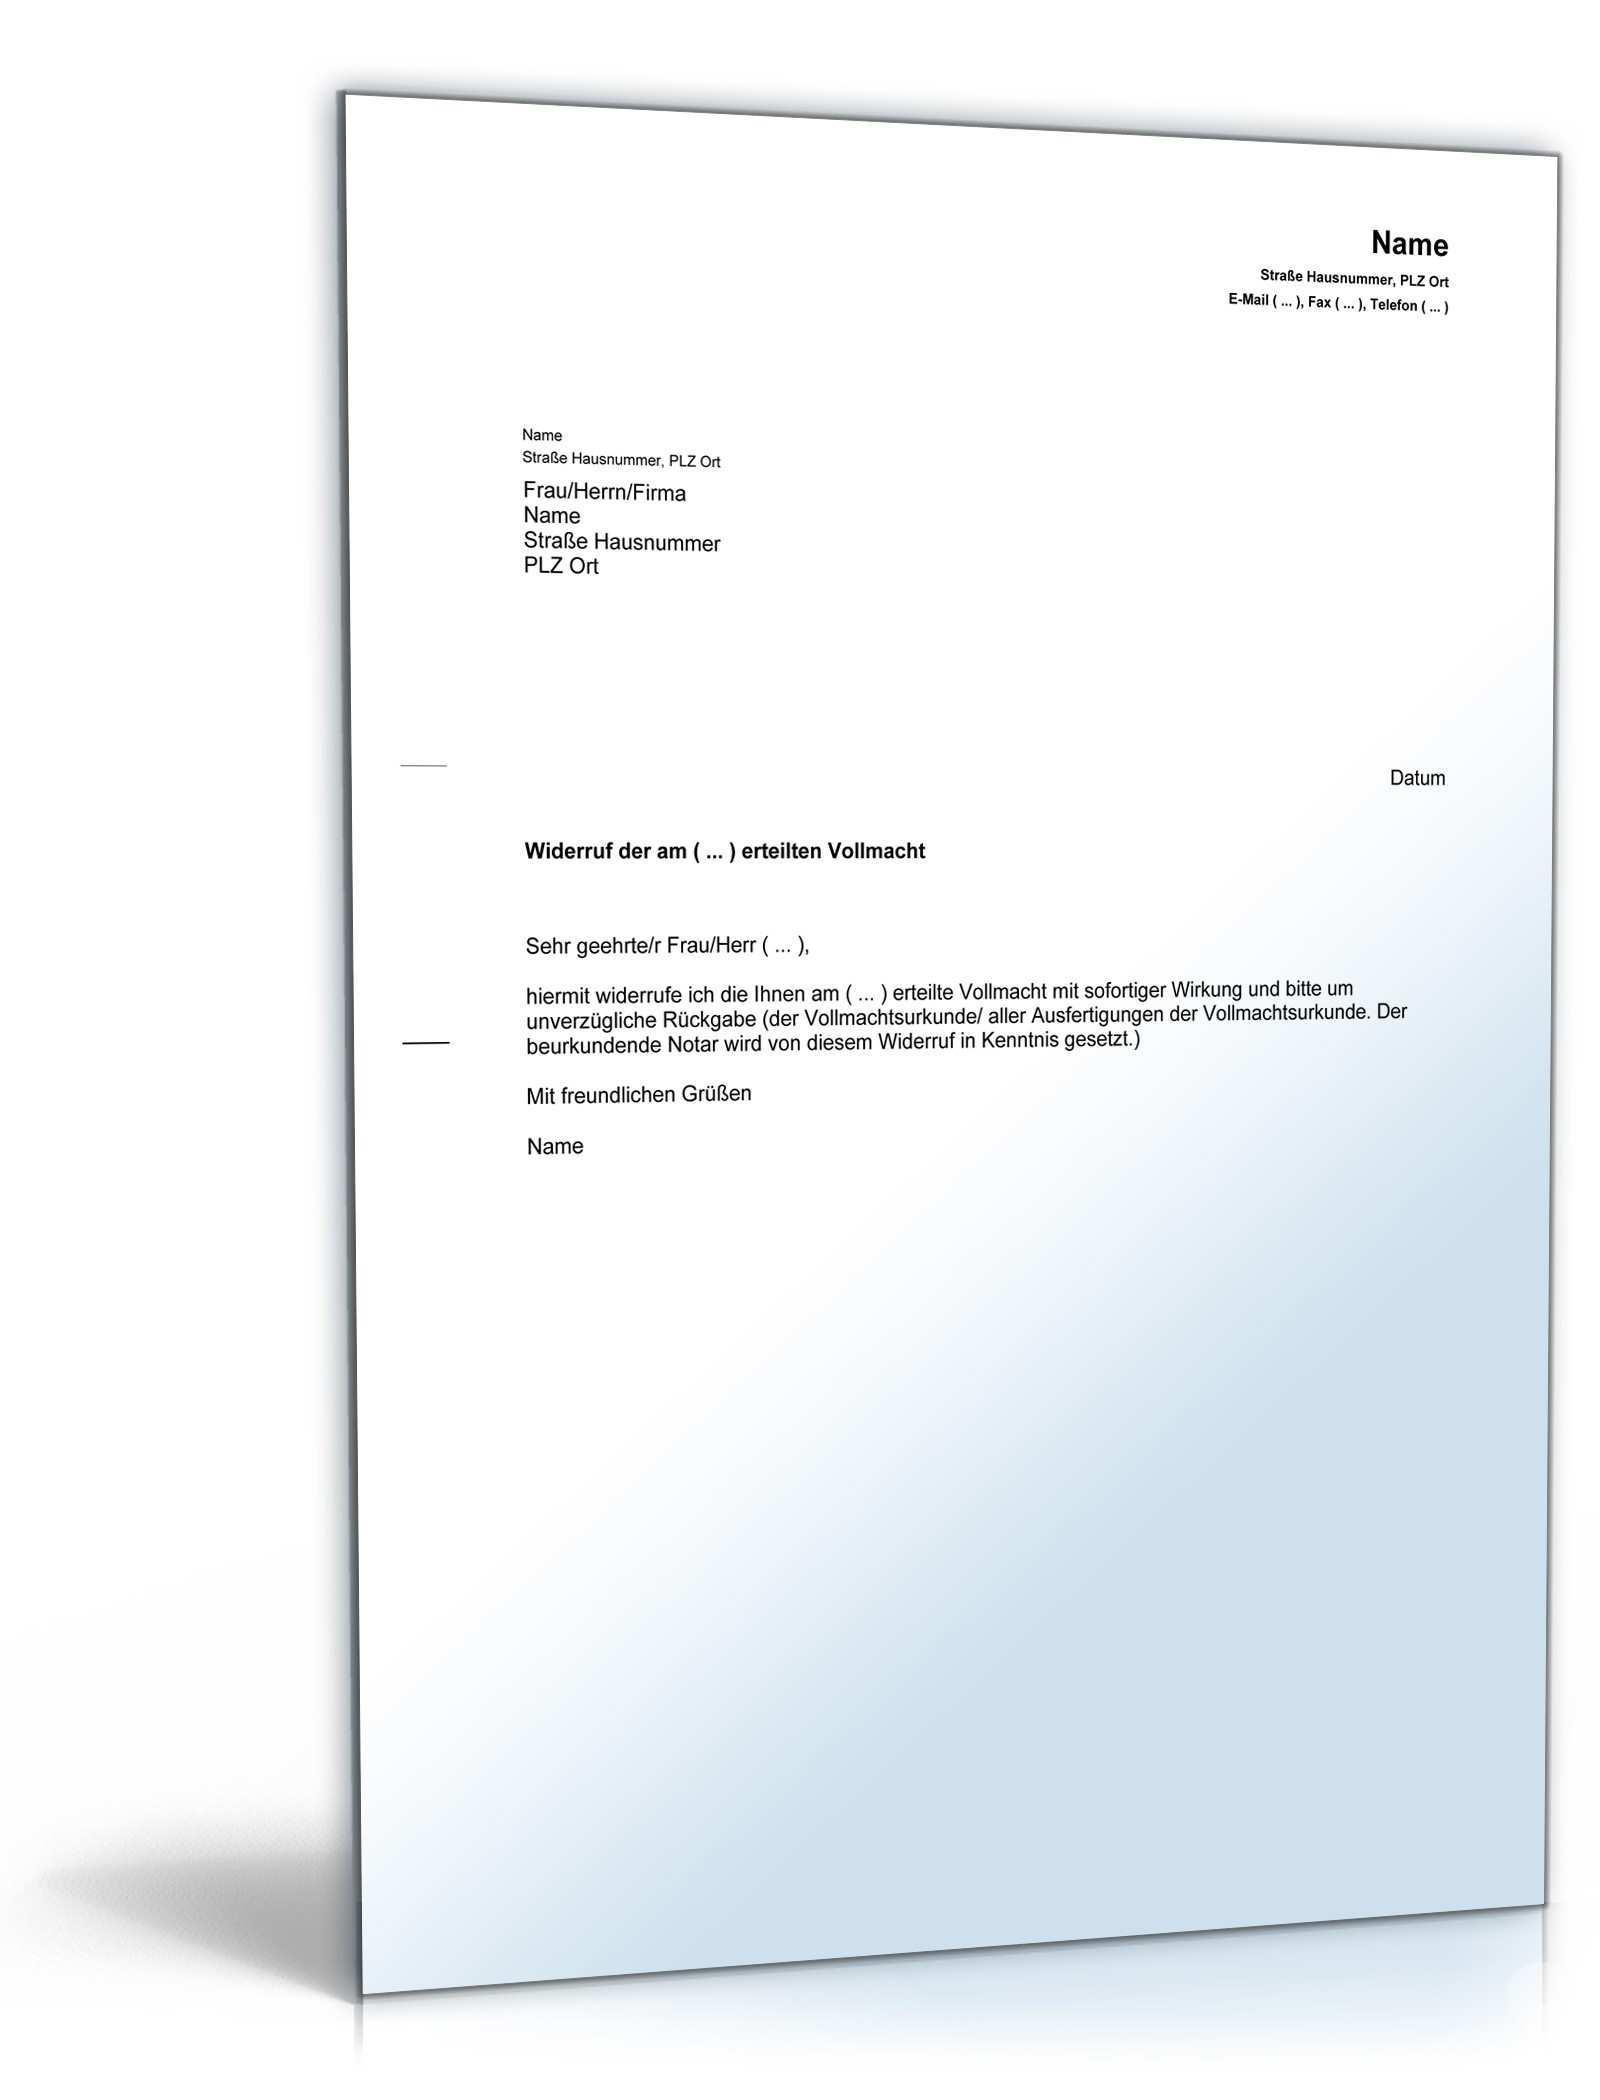 Arbeitsvertrag Widerrufen Muster